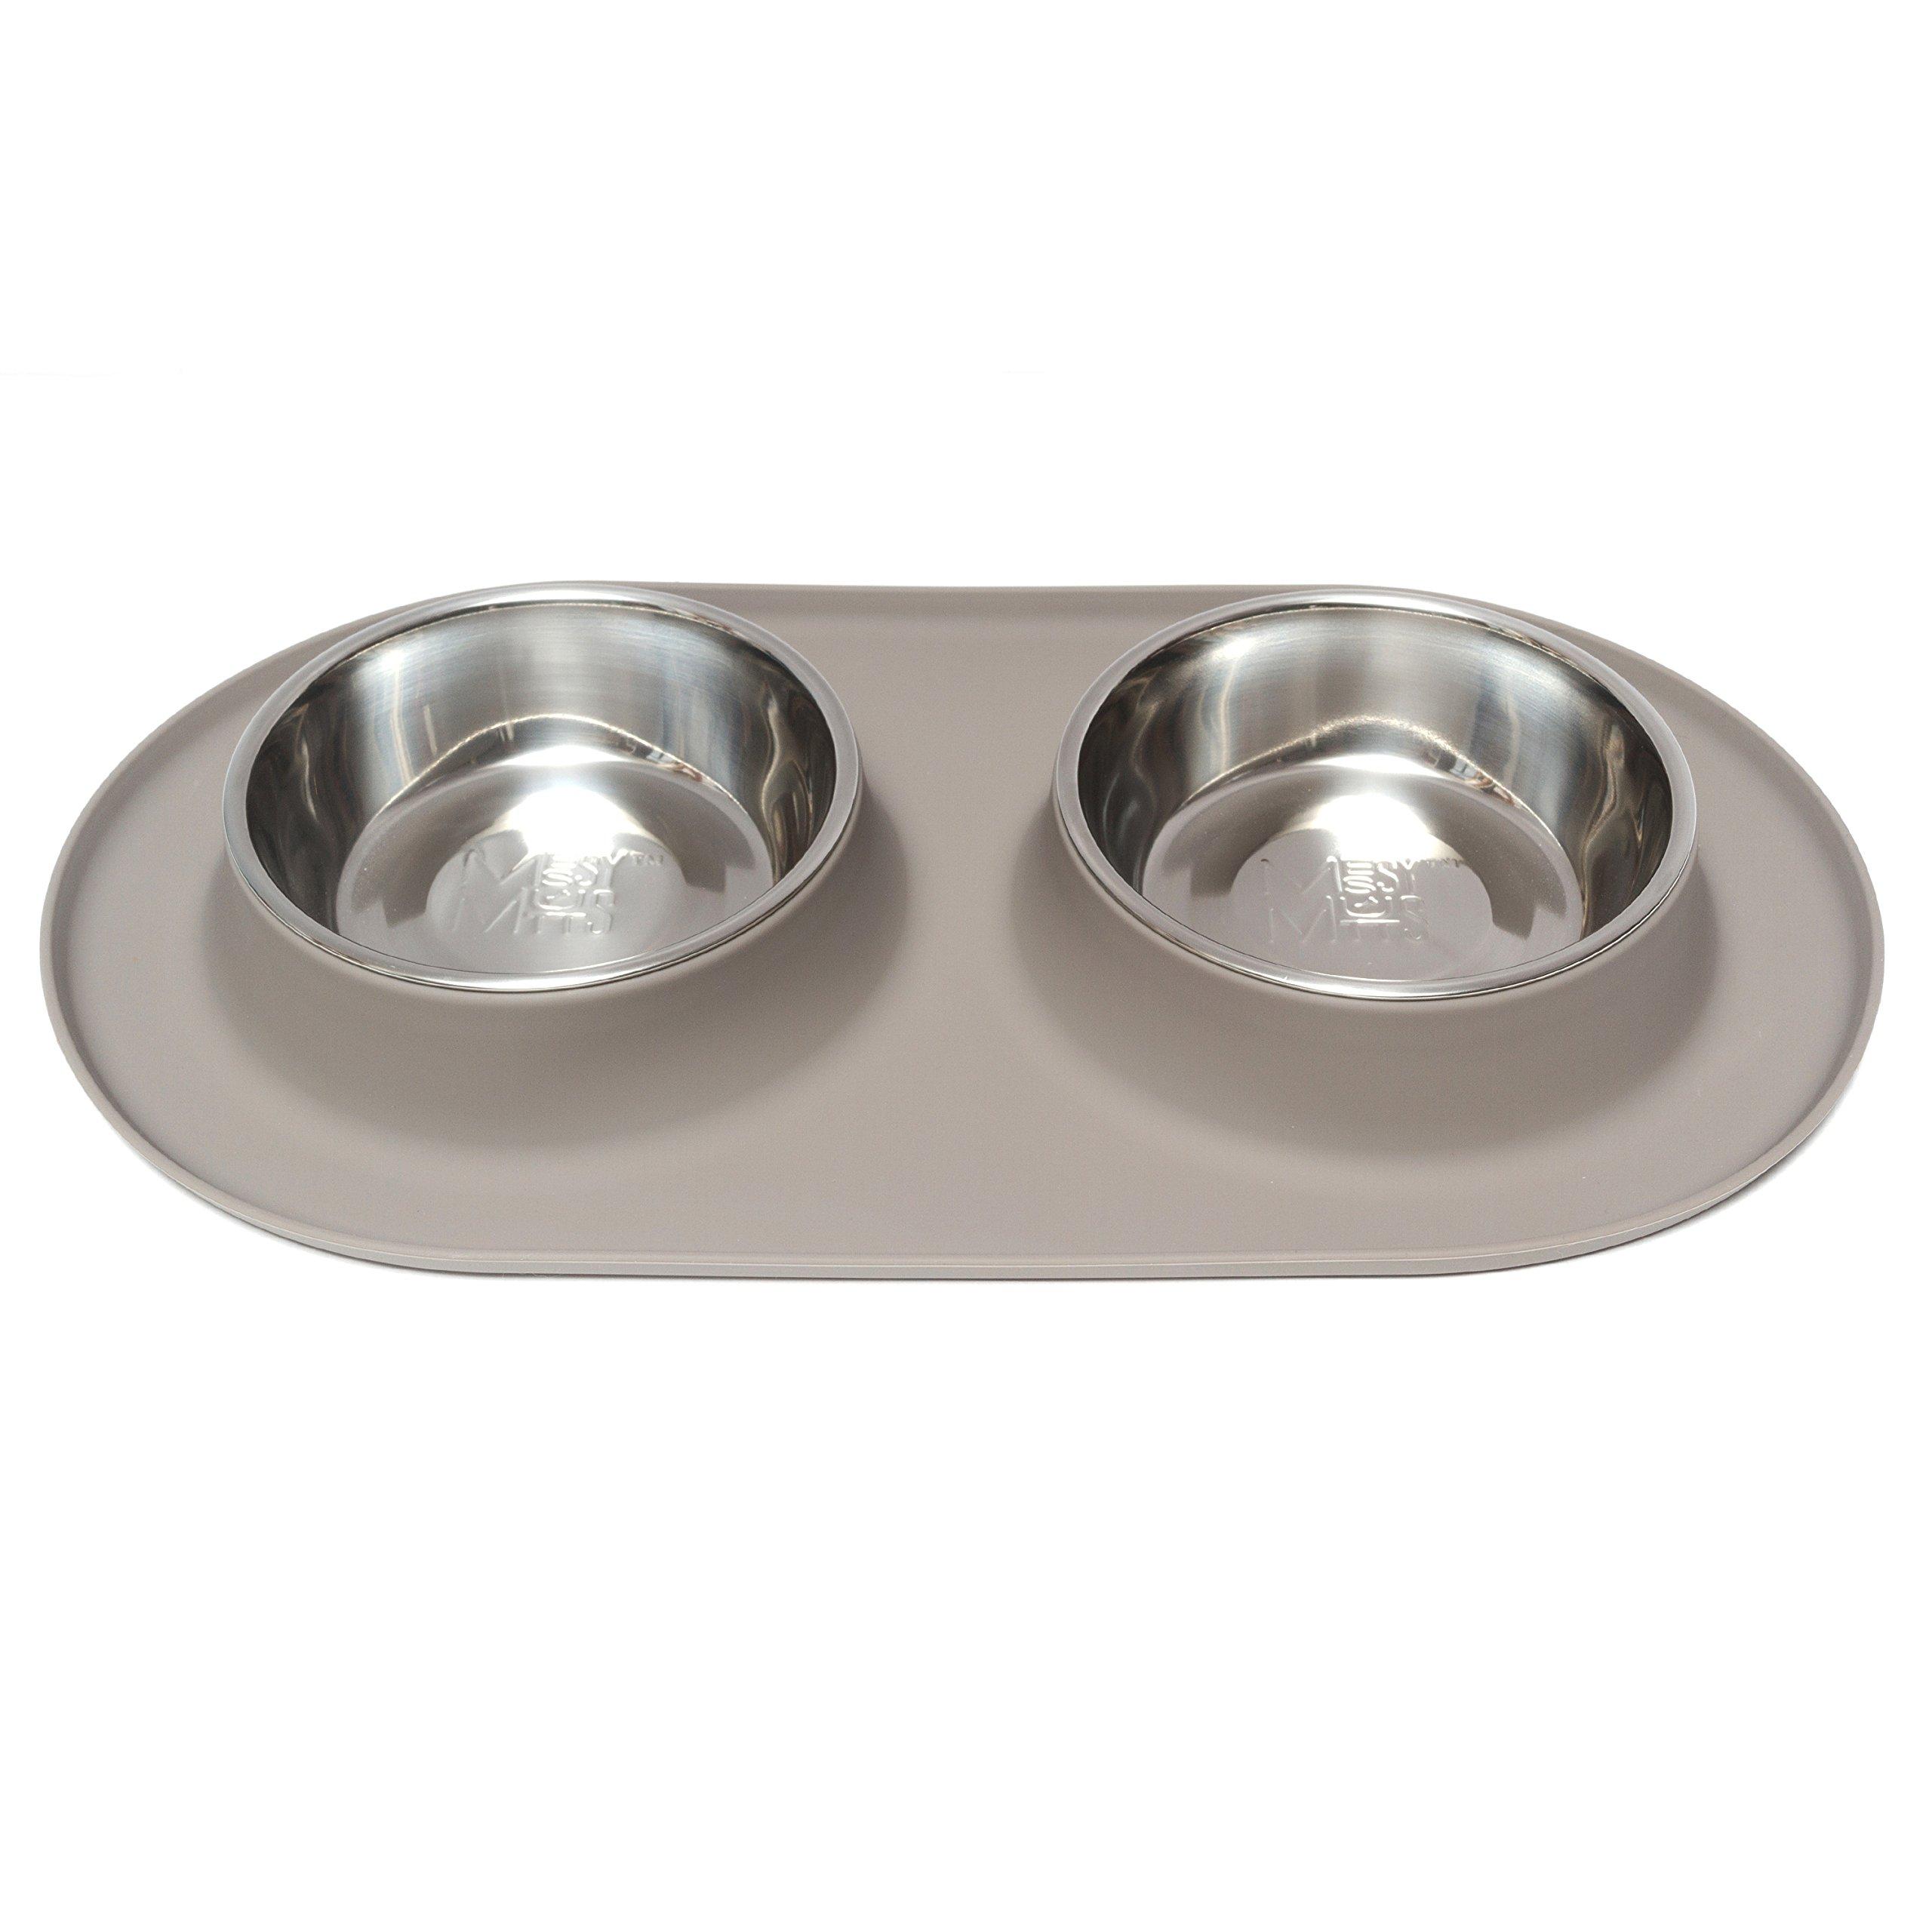 Messy Mutts Silicone Double Dog Feeder - Medium/Grey